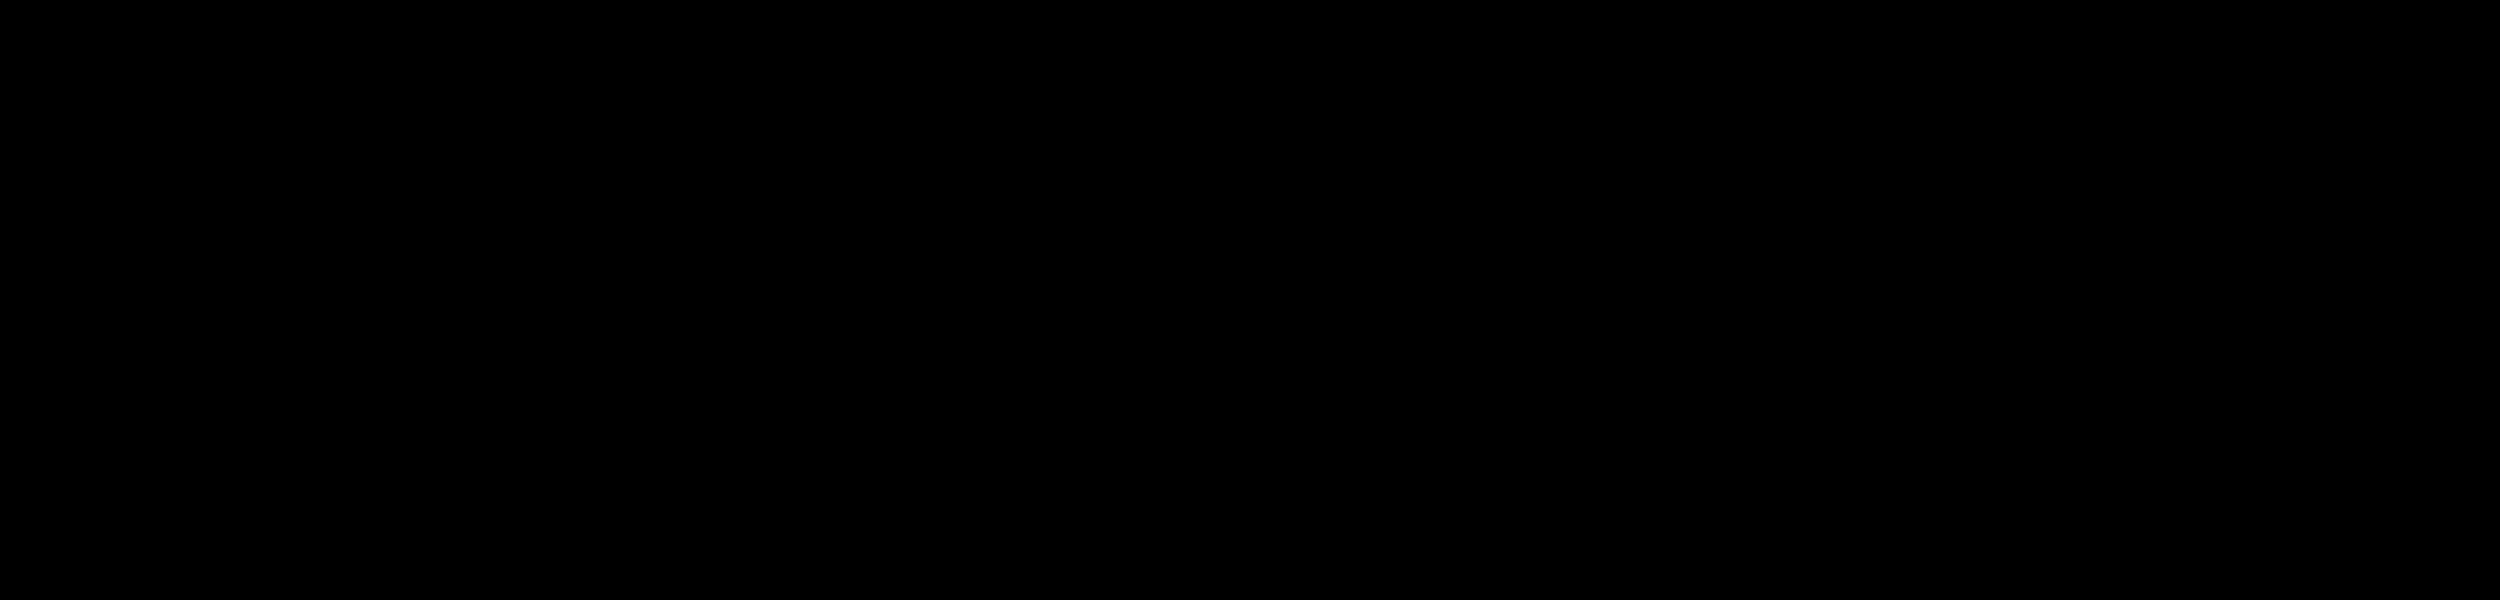 logo-new-2500x600